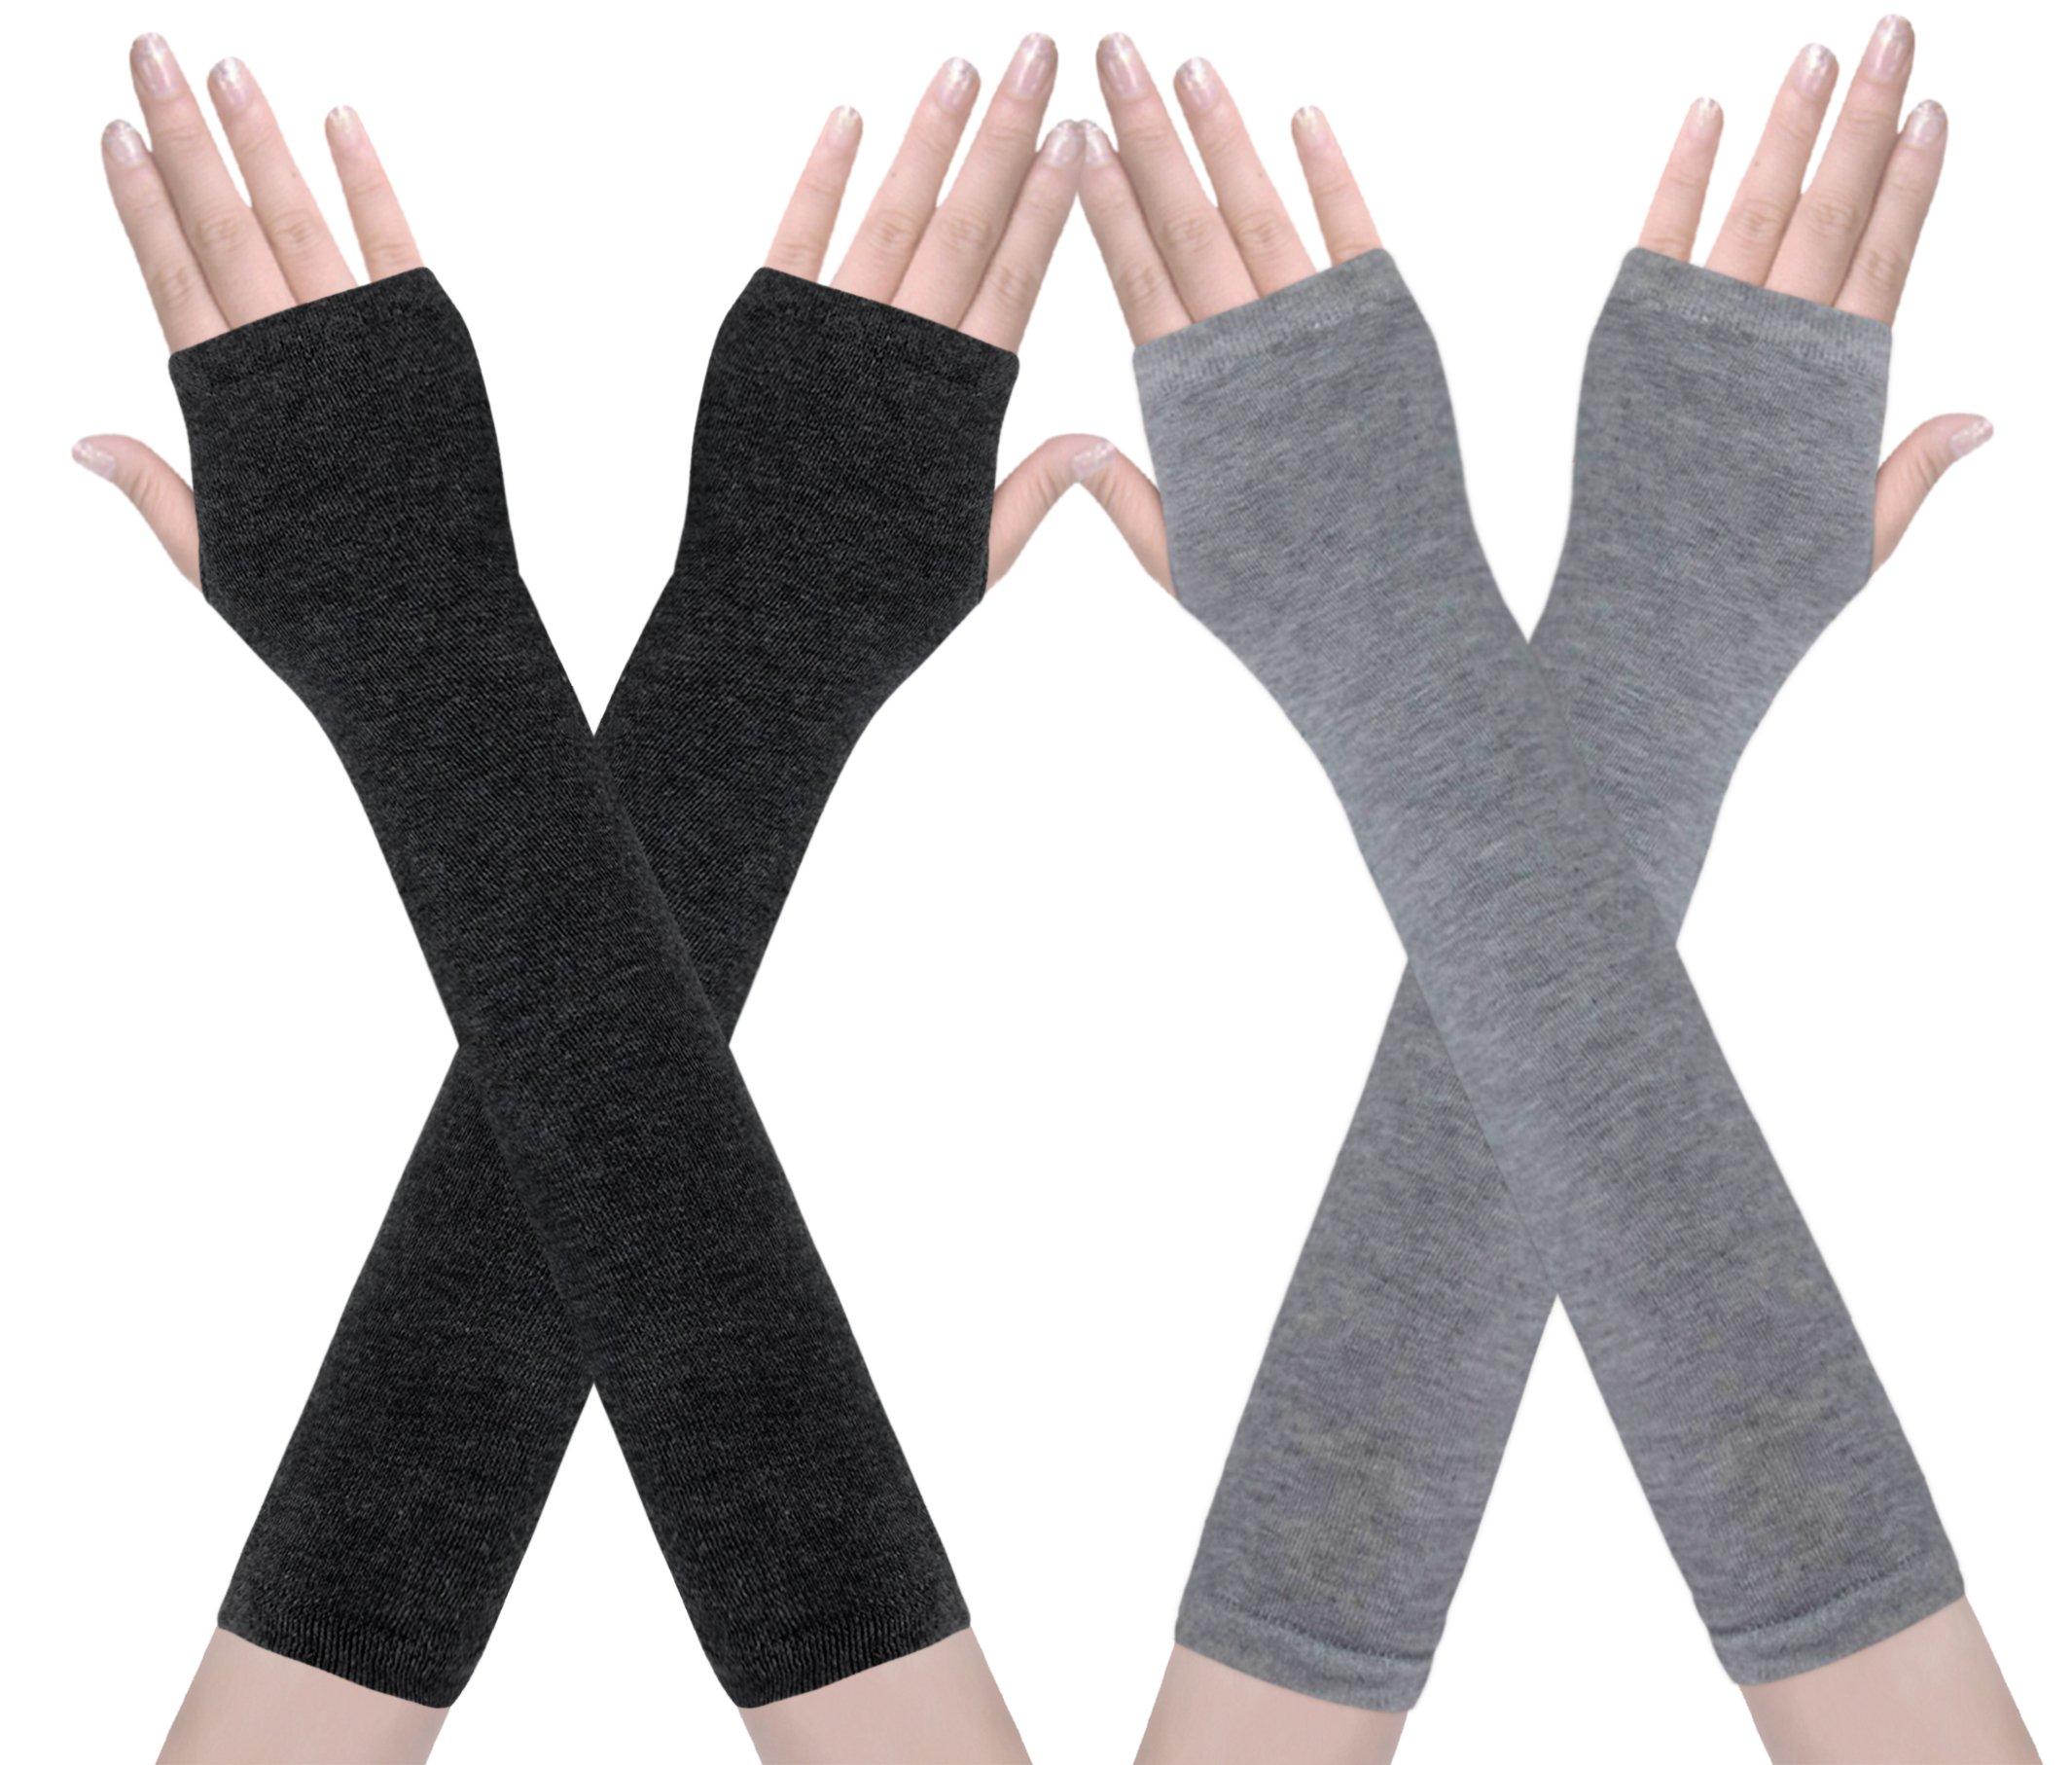 Amandir 2 Pairs Womens Fingerless Gloves, Long Arm Warmer Gloves